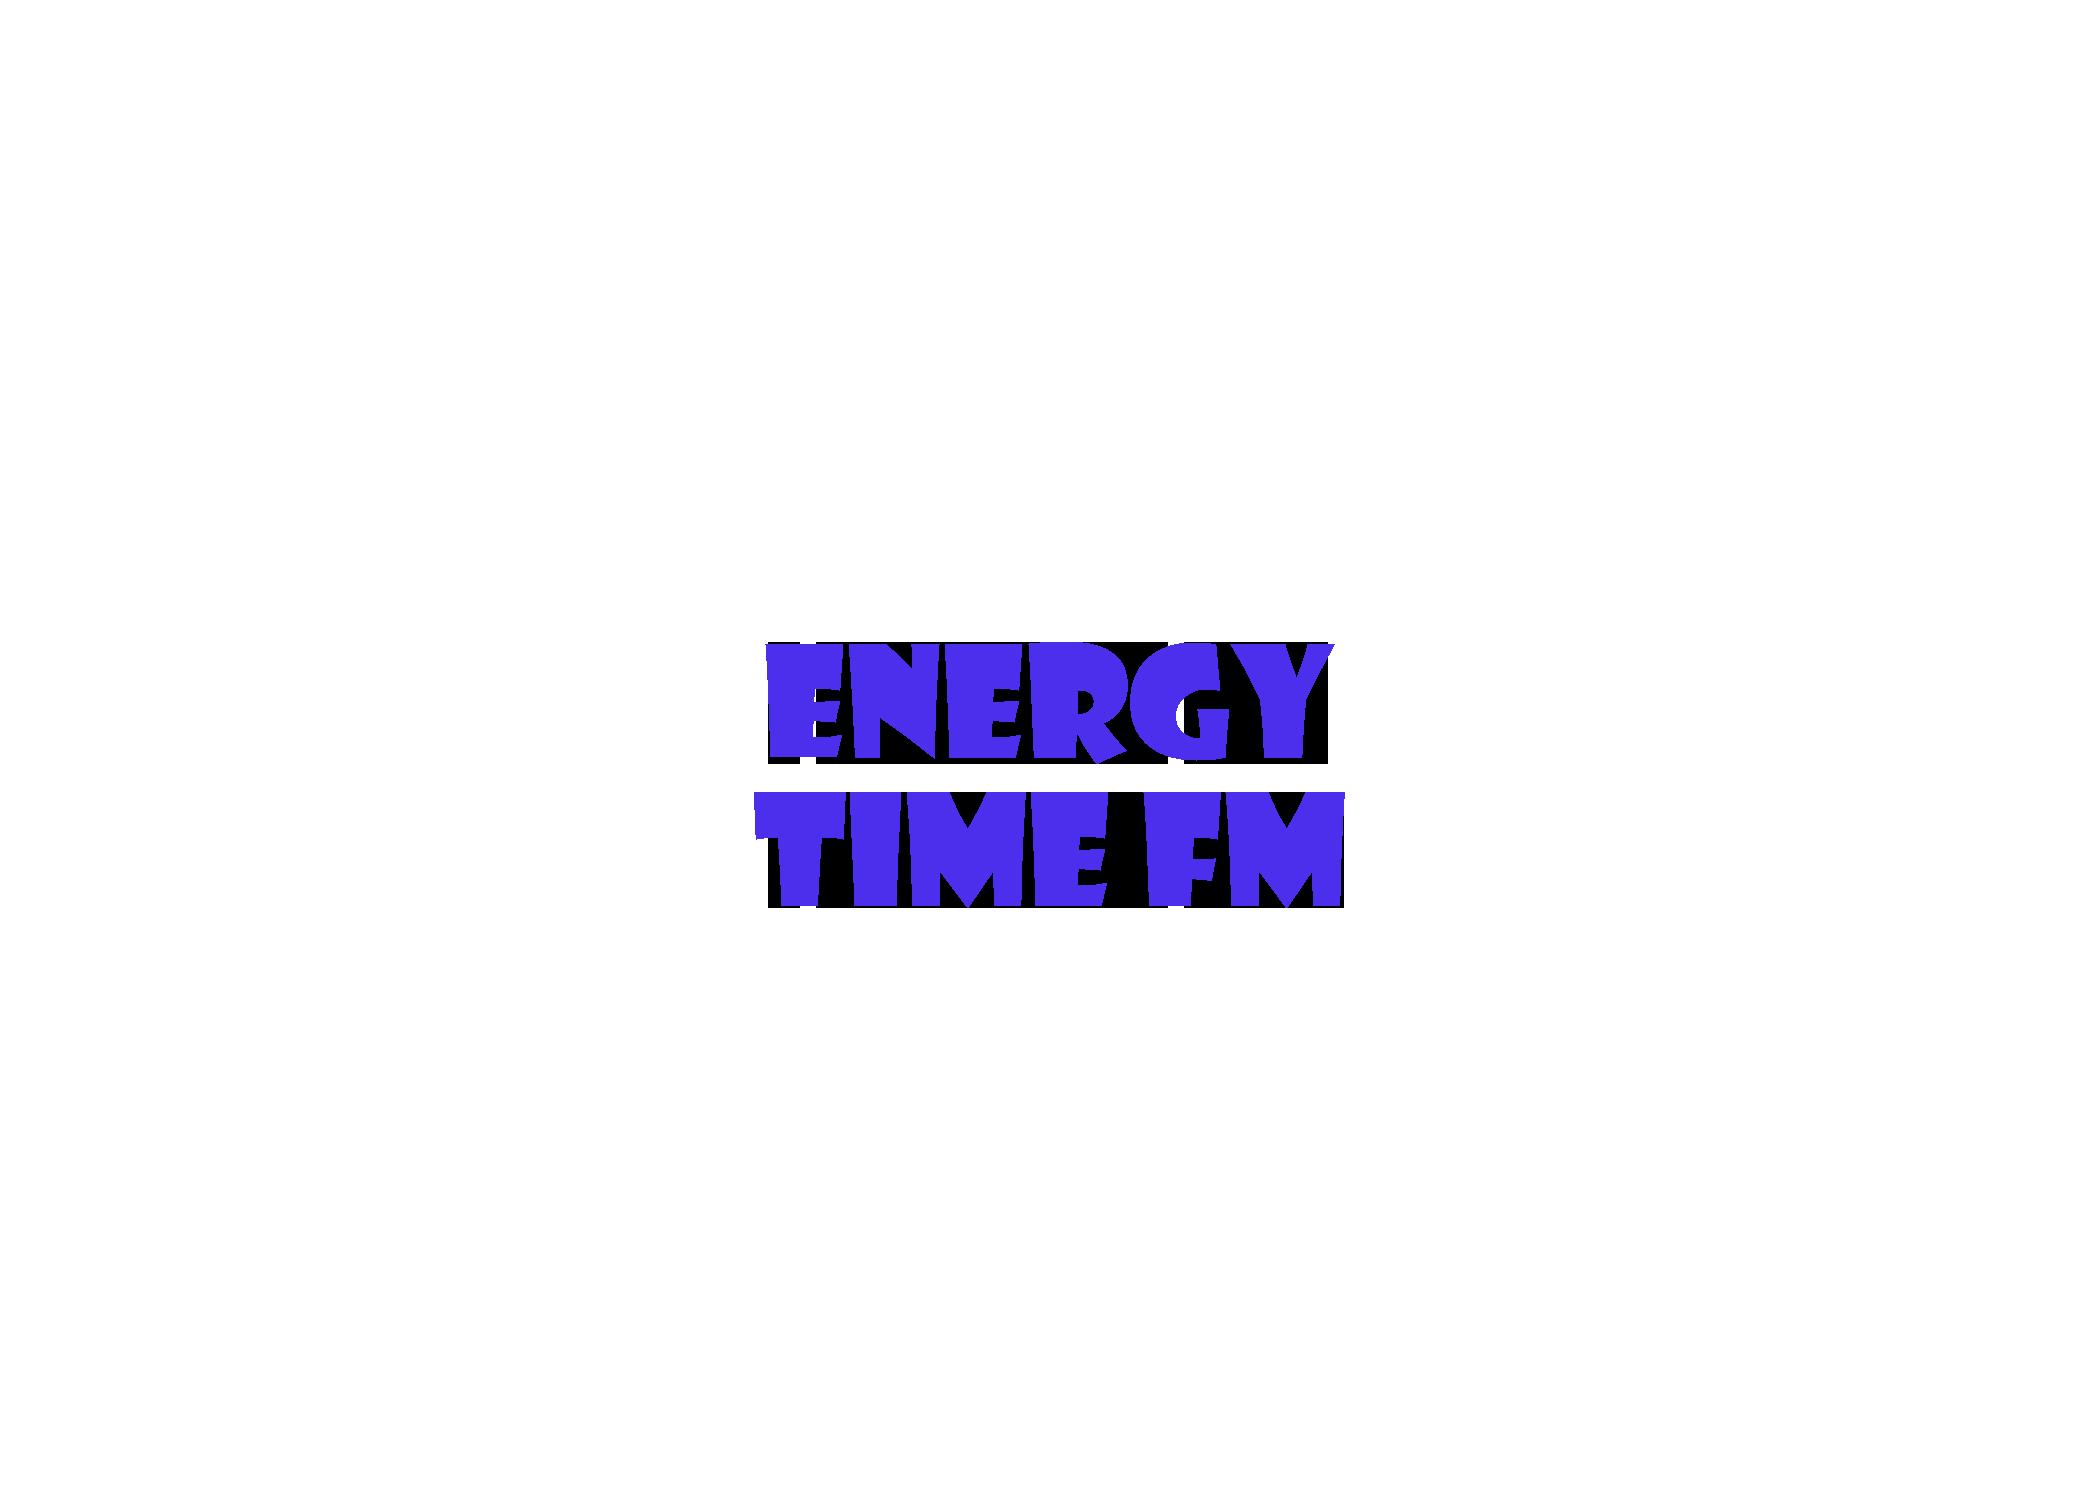 Energy Time FM